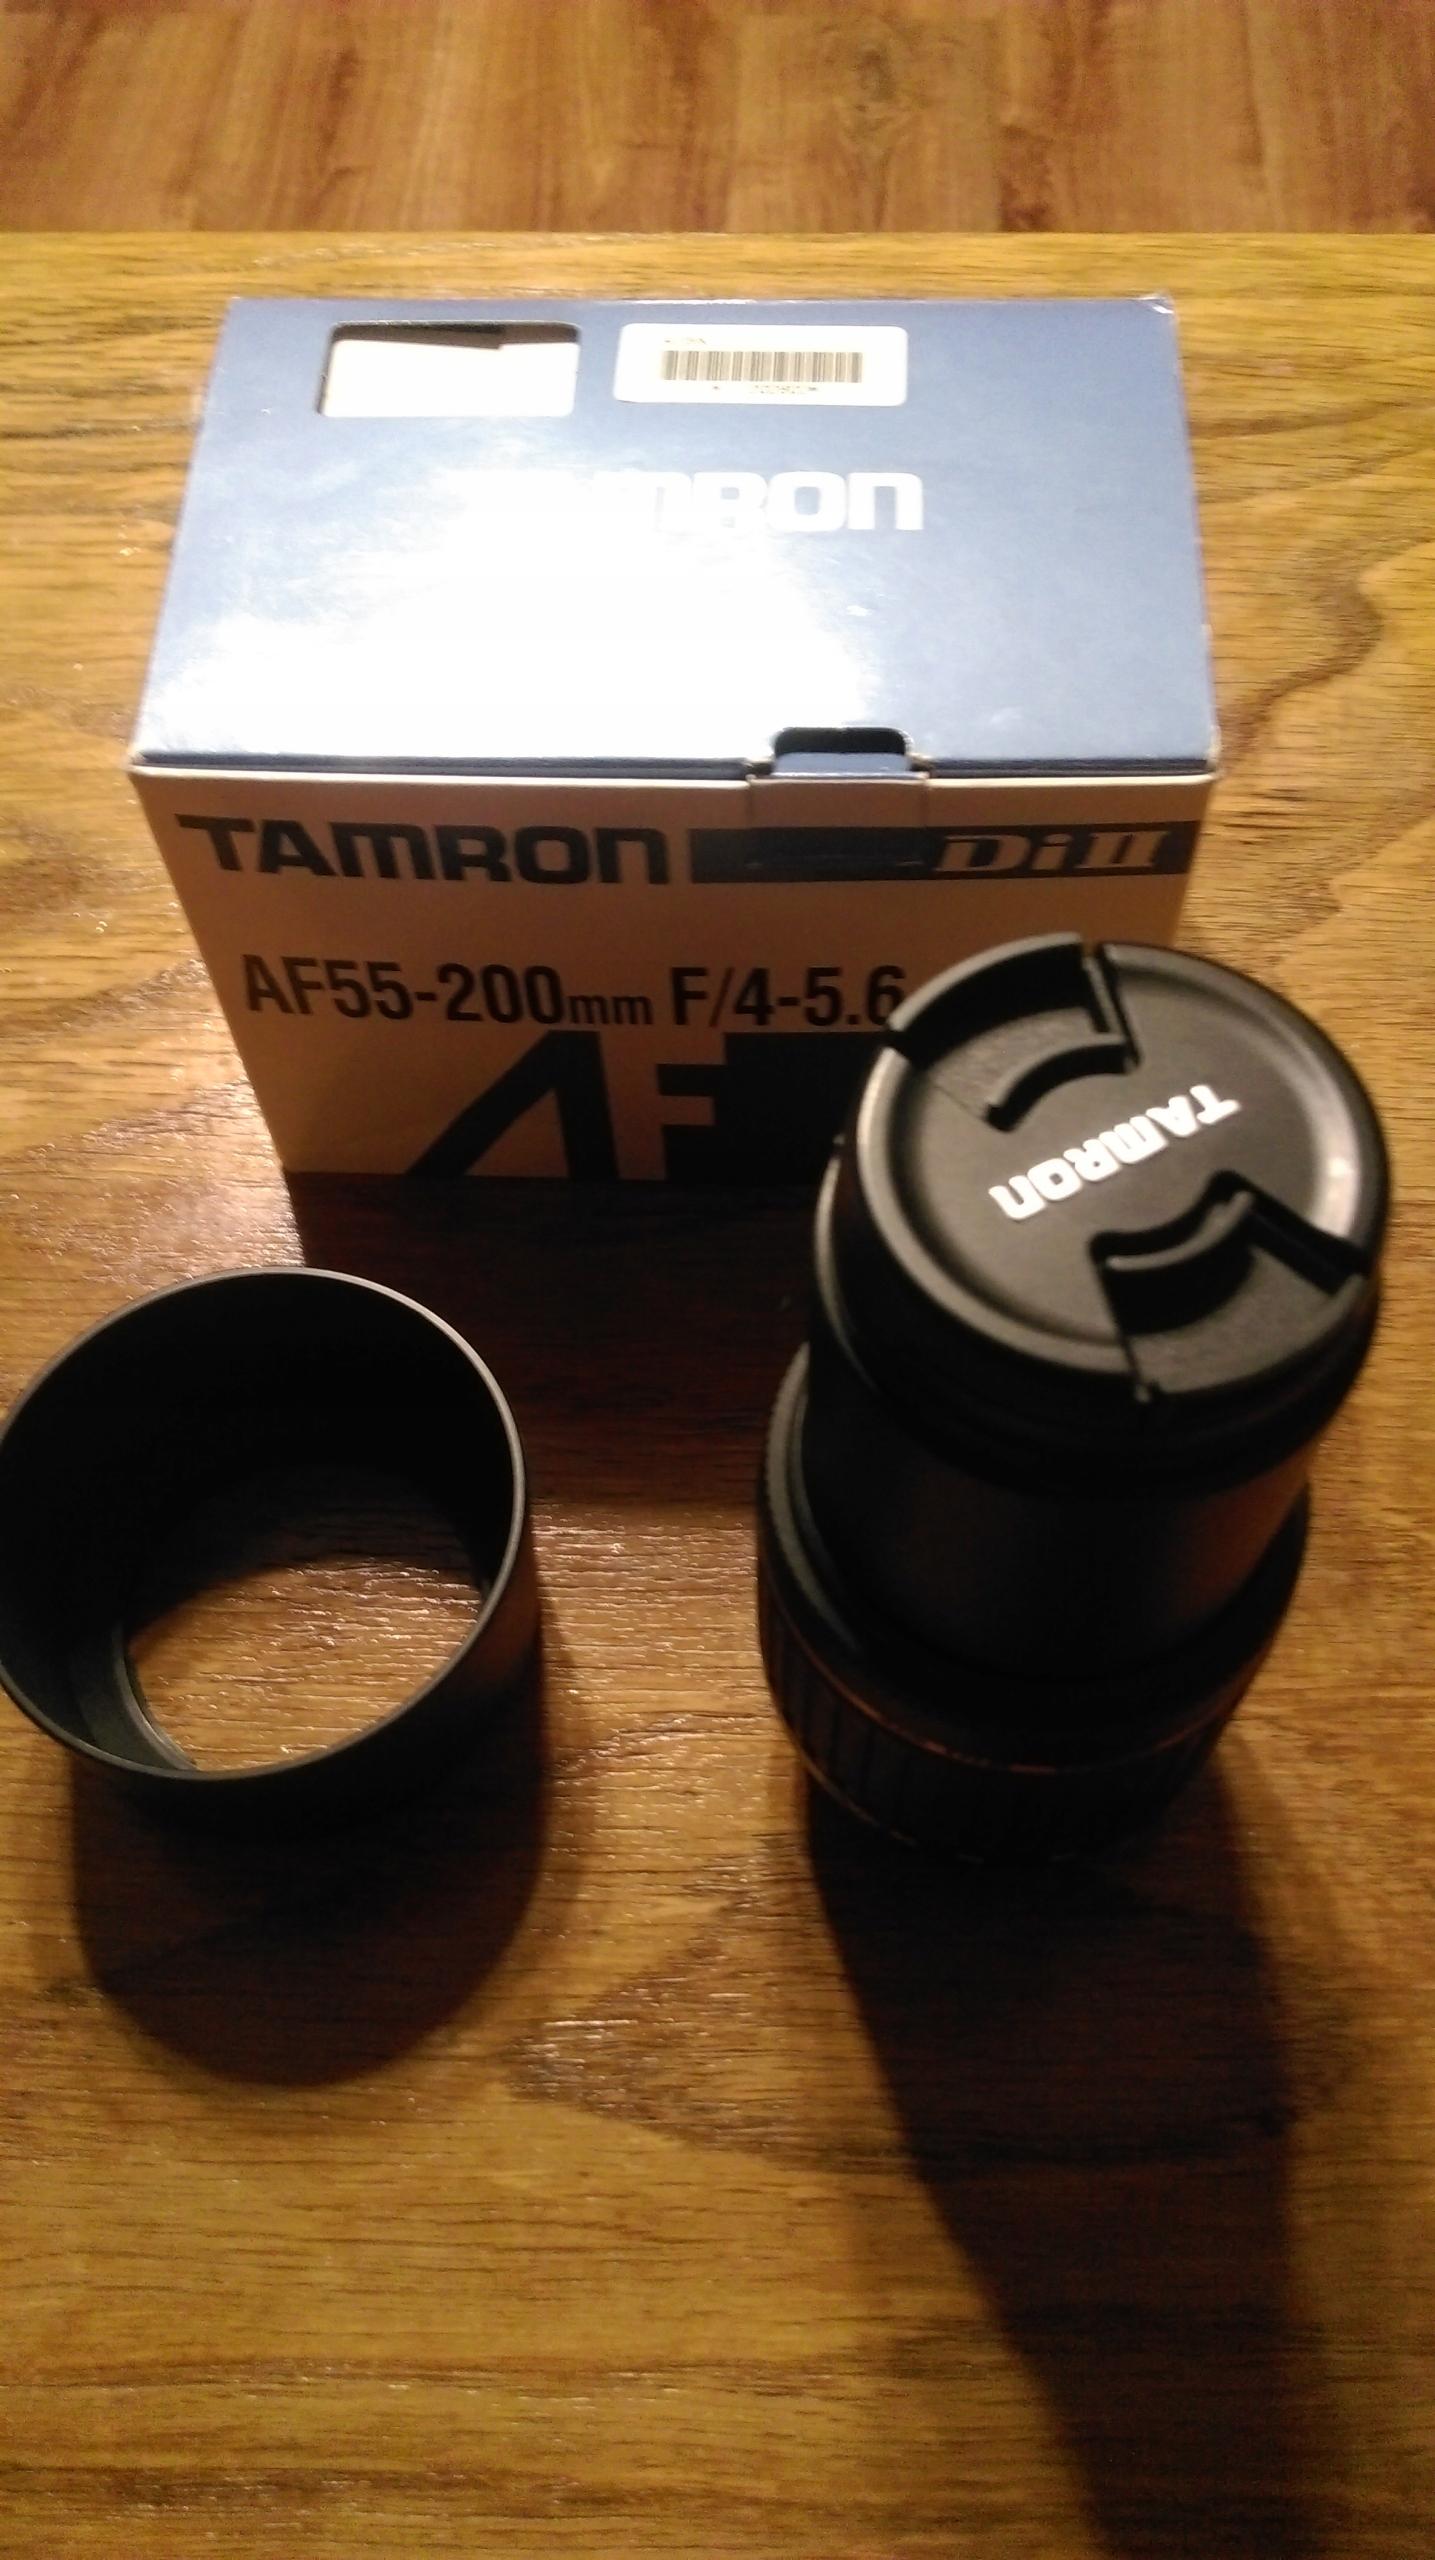 Tamron AF 55-200 mm f/4-5.6 Di II LD Macro